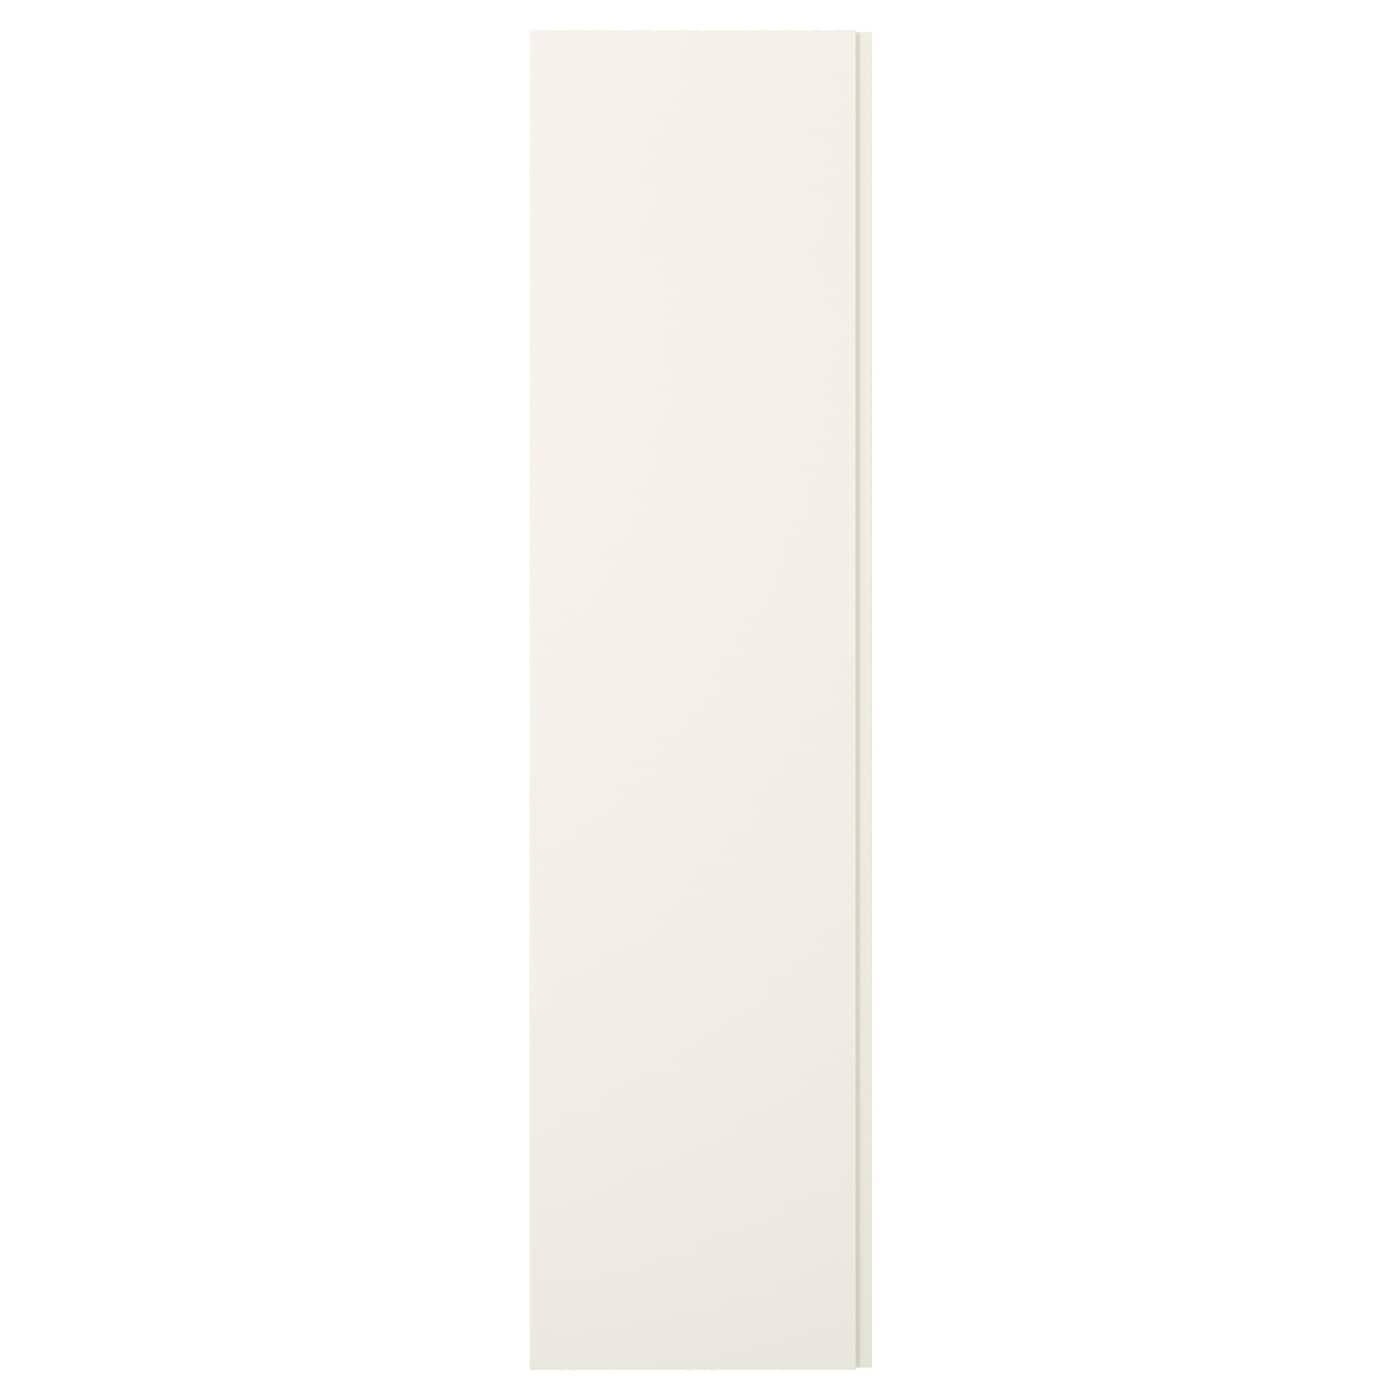 Awesome Ikea Küchenplaner Download Images - Ridgewayng.com ...